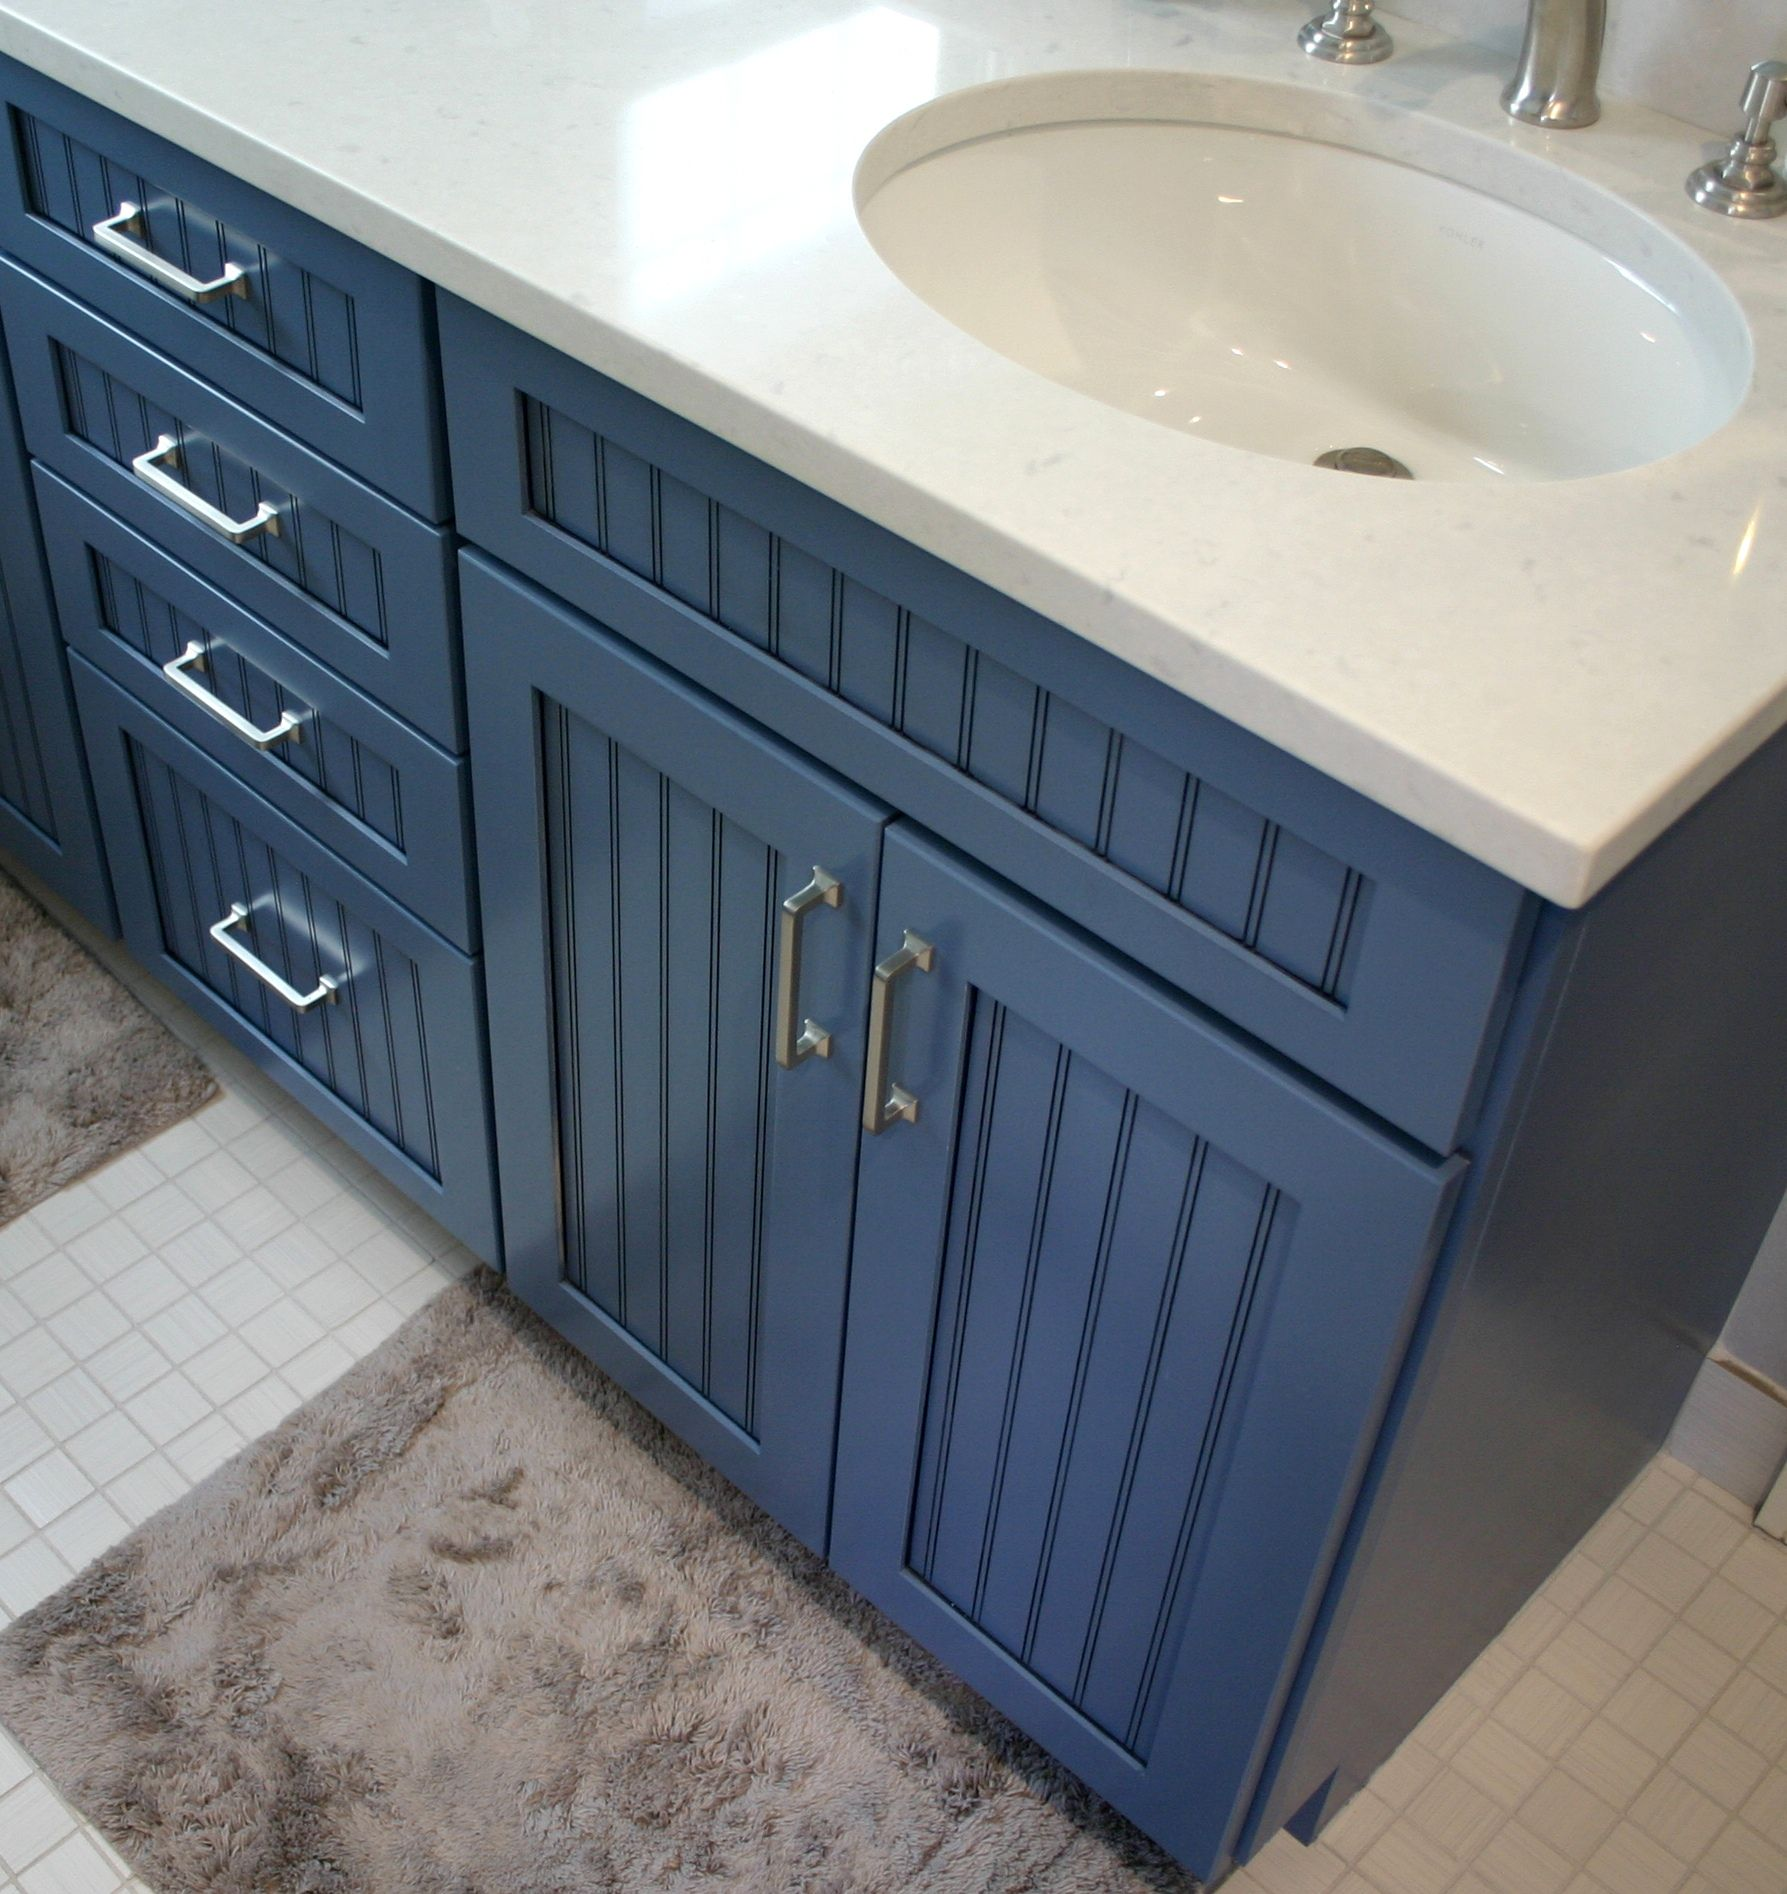 Baths Contemporary Bathroom Decor Bathroom Decor Blue Bathroom Vanity